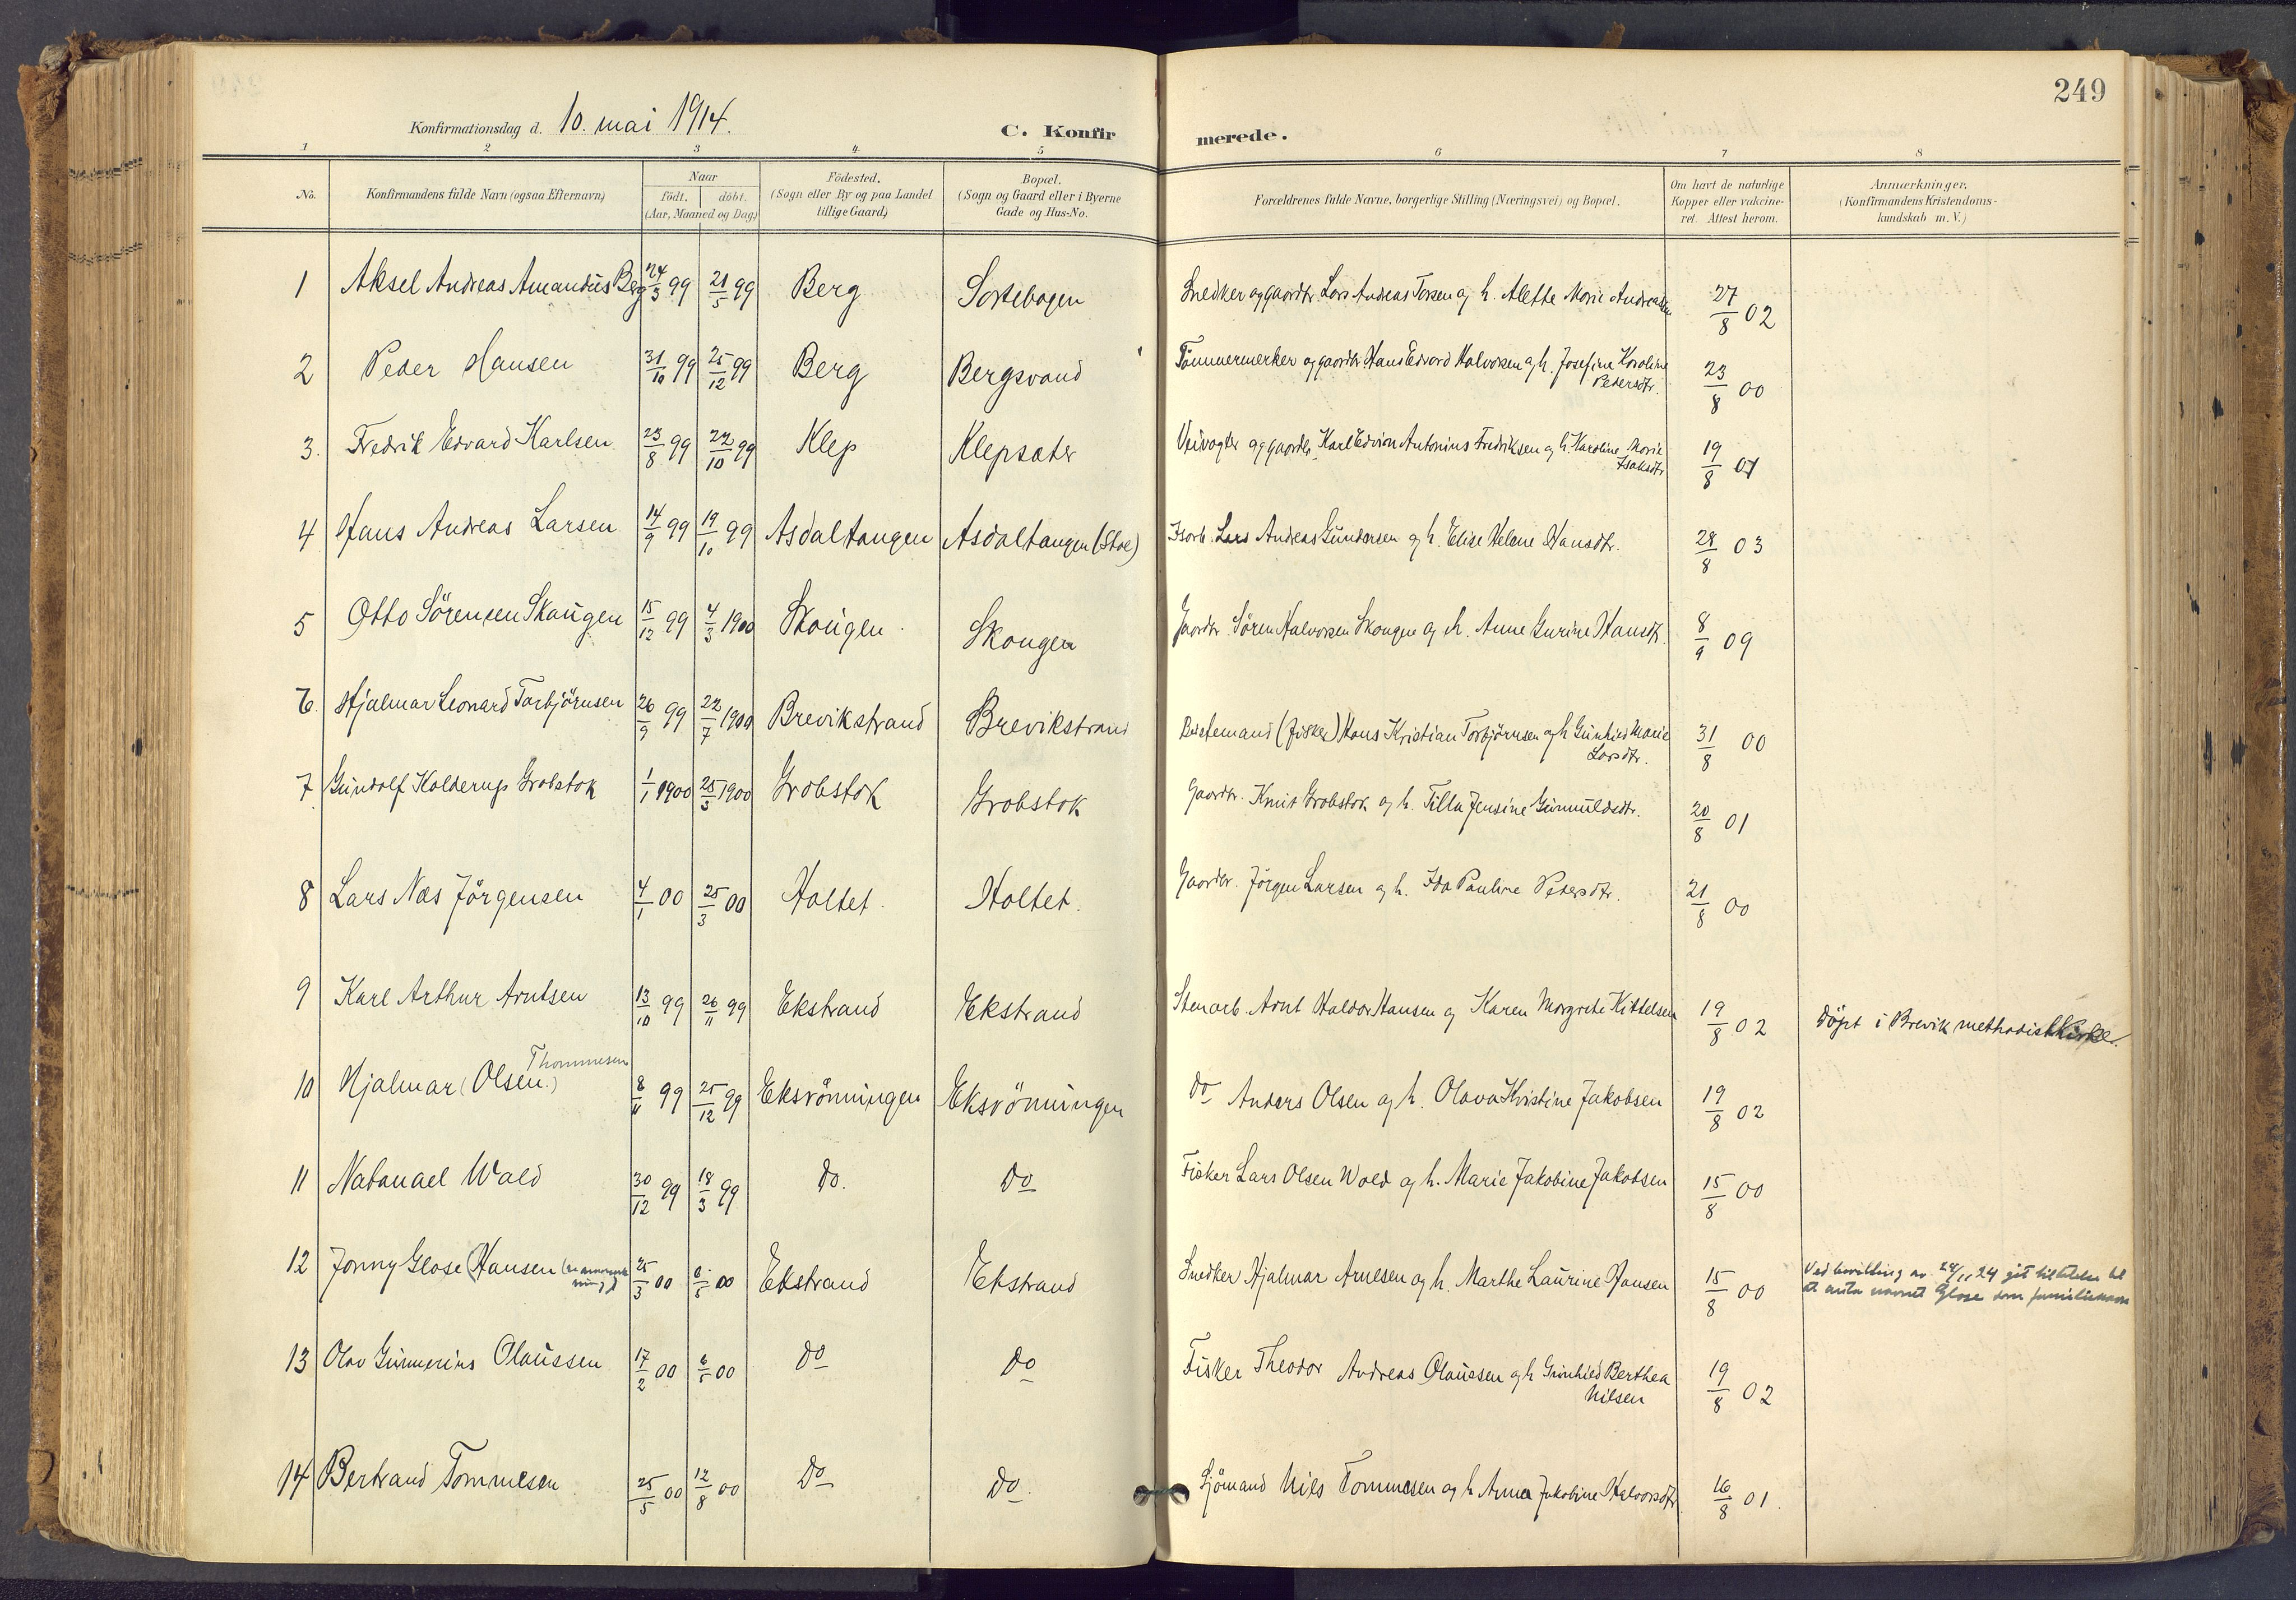 SAKO, Bamble kirkebøker, F/Fa/L0009: Ministerialbok nr. I 9, 1901-1917, s. 249